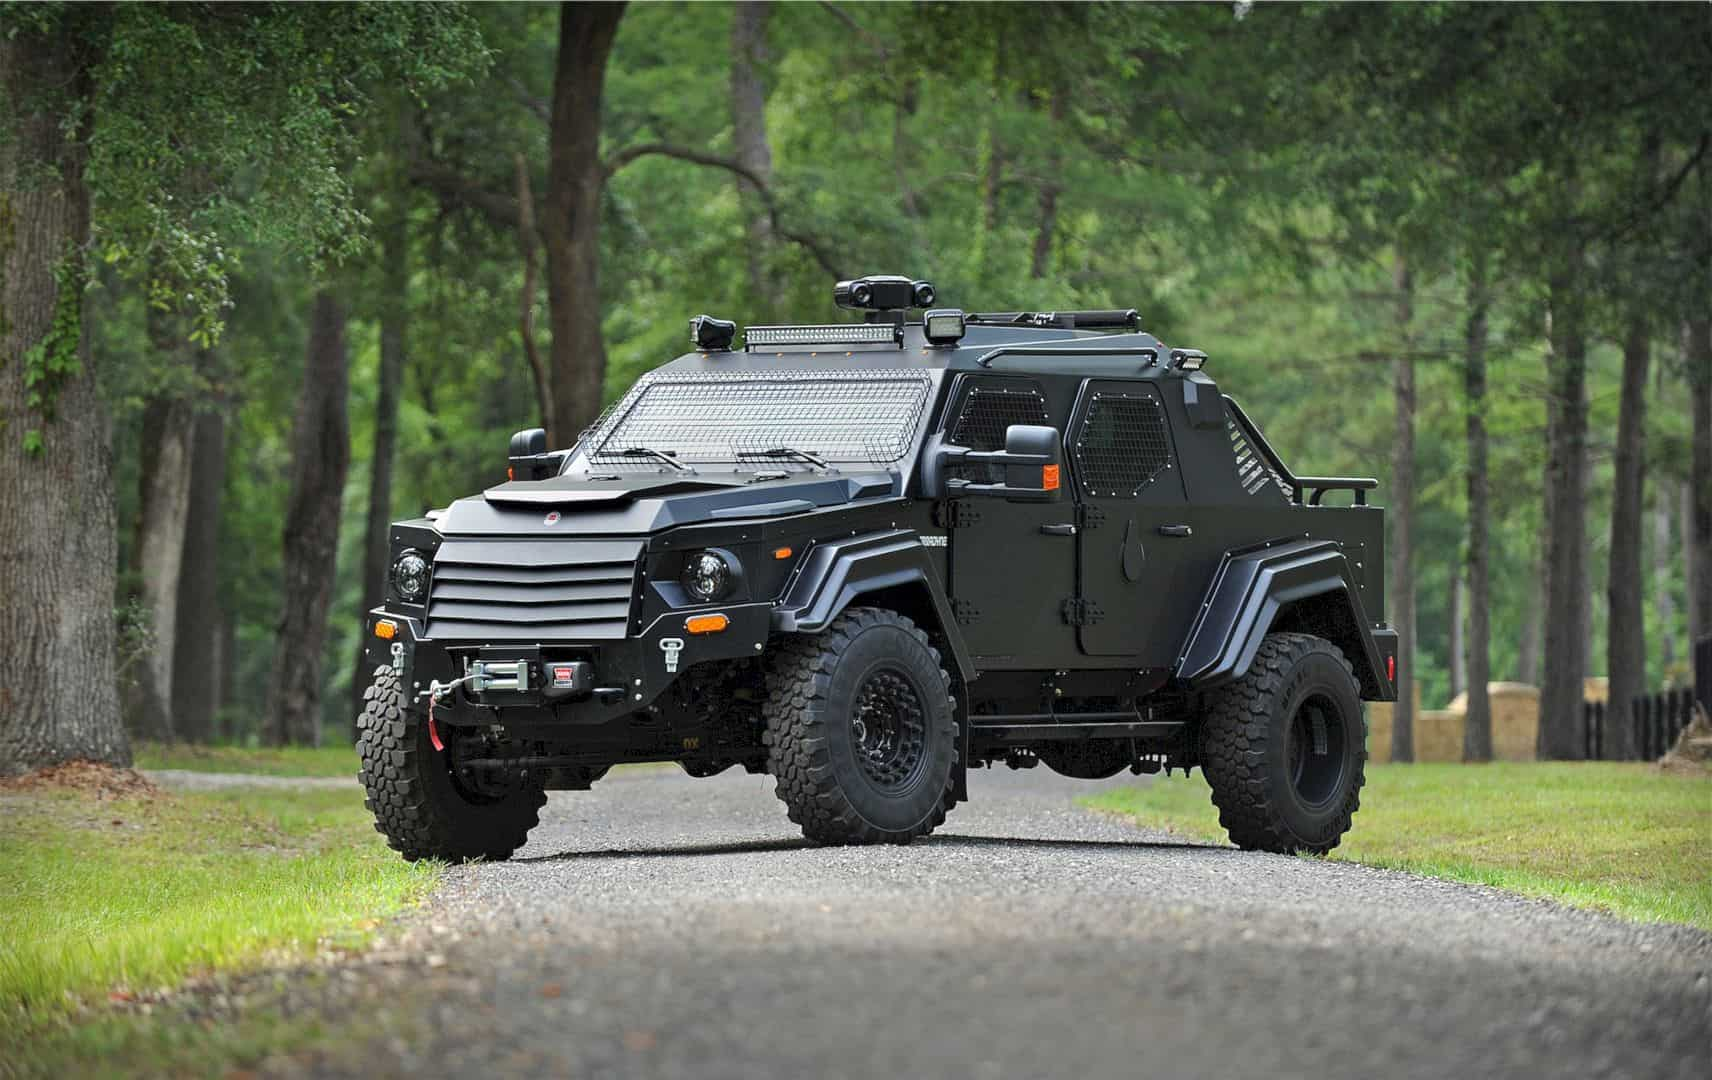 Gurkha CIV from Terradyne: The Mightiest SUV on The Market